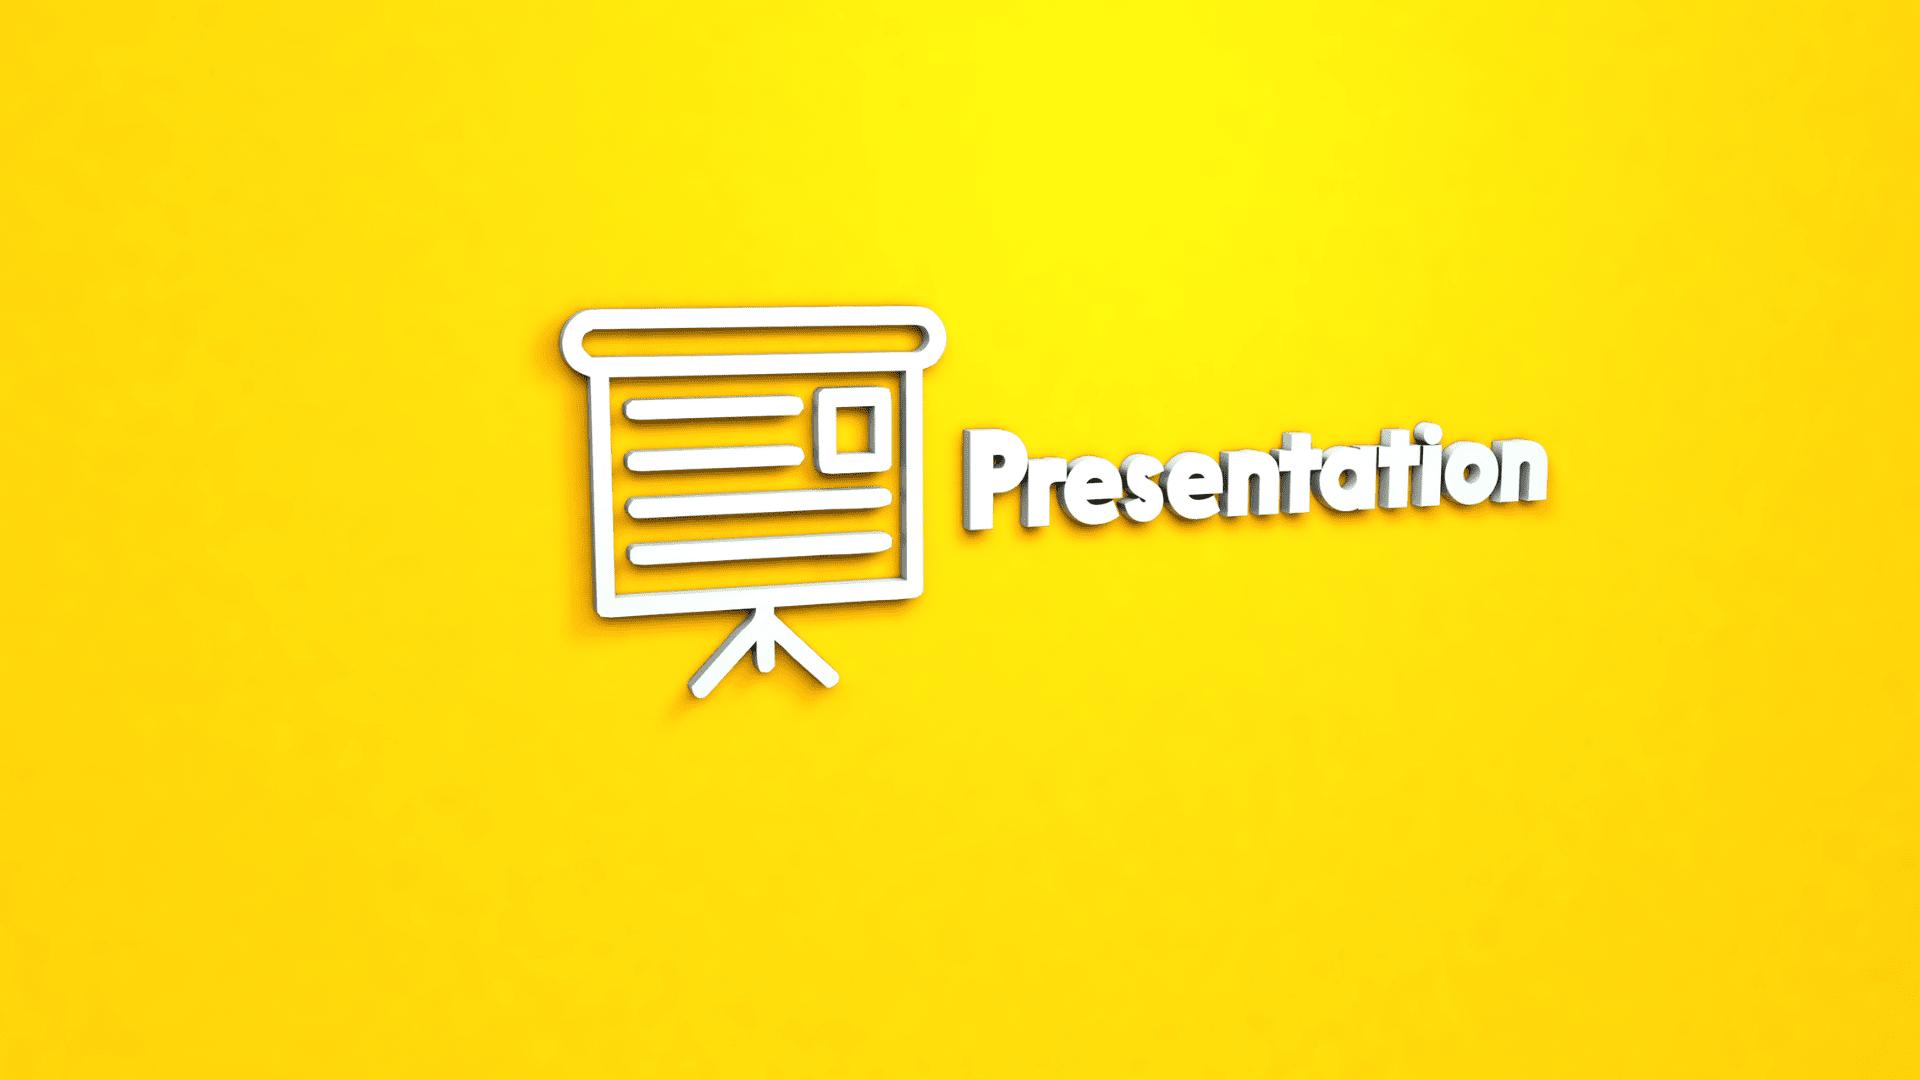 шрифт для презентации баннер